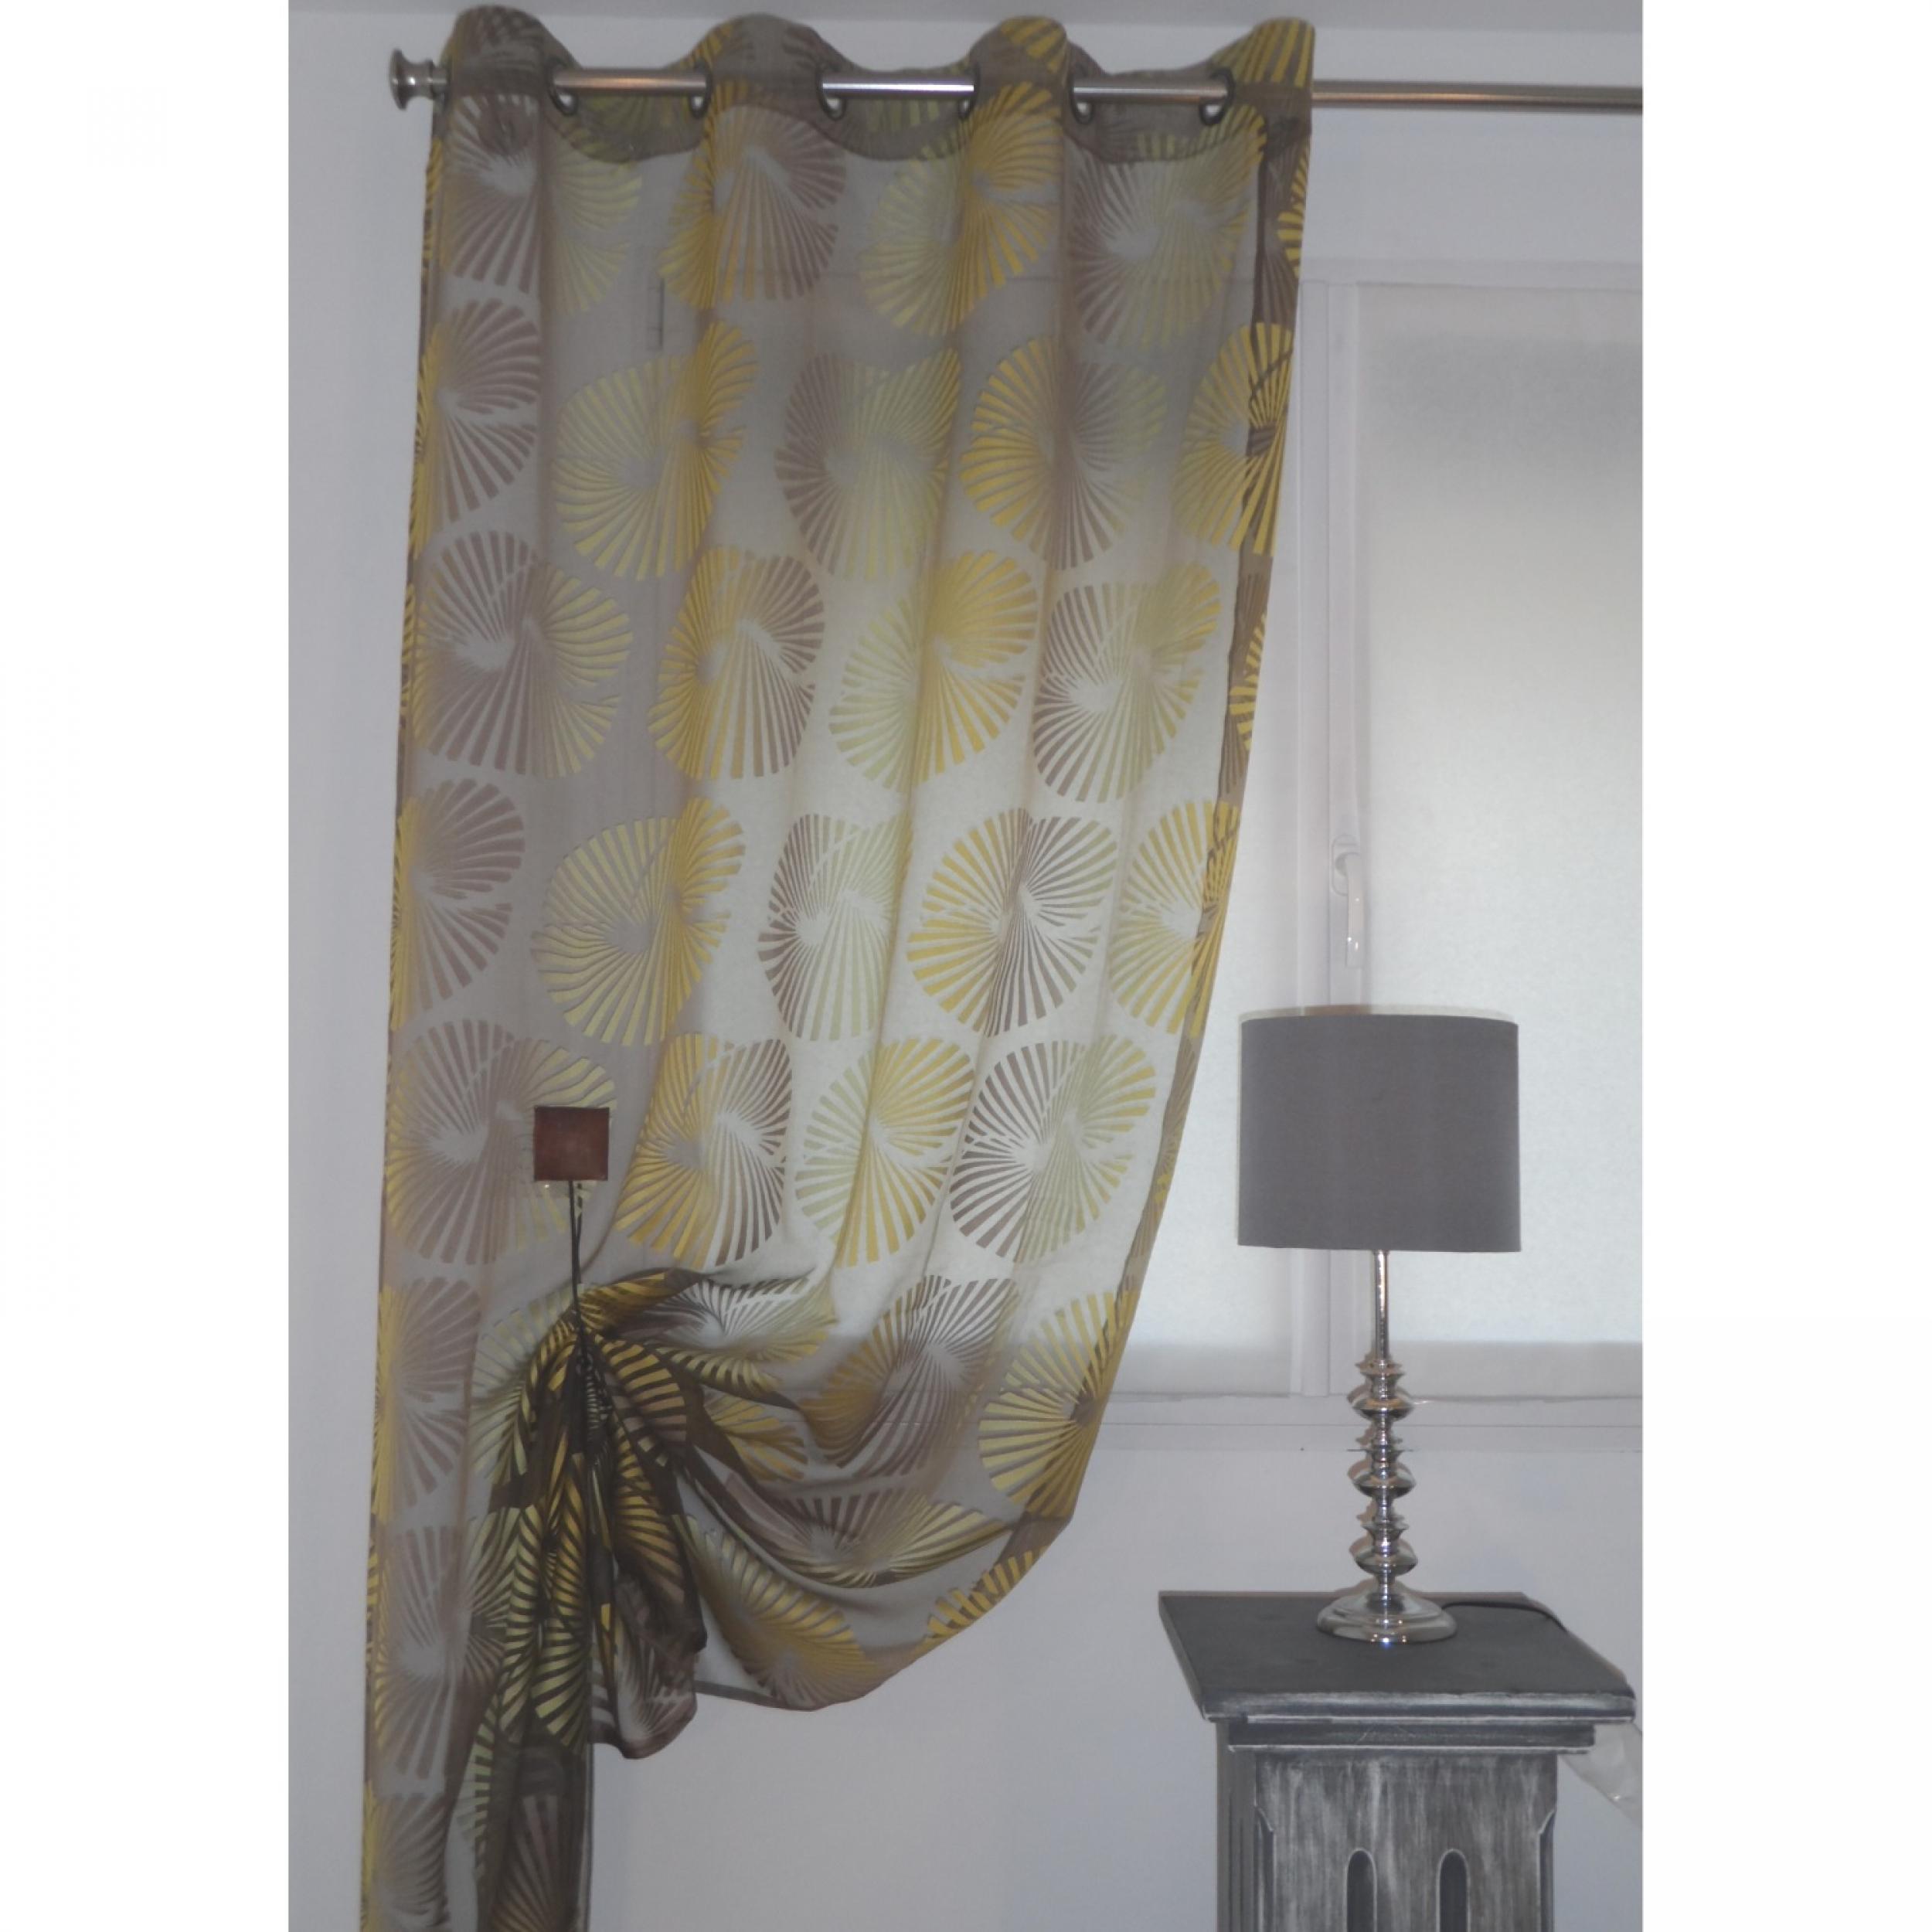 rideaux voilage ado lucciana chocolat jaune 155 x 270 cm. Black Bedroom Furniture Sets. Home Design Ideas